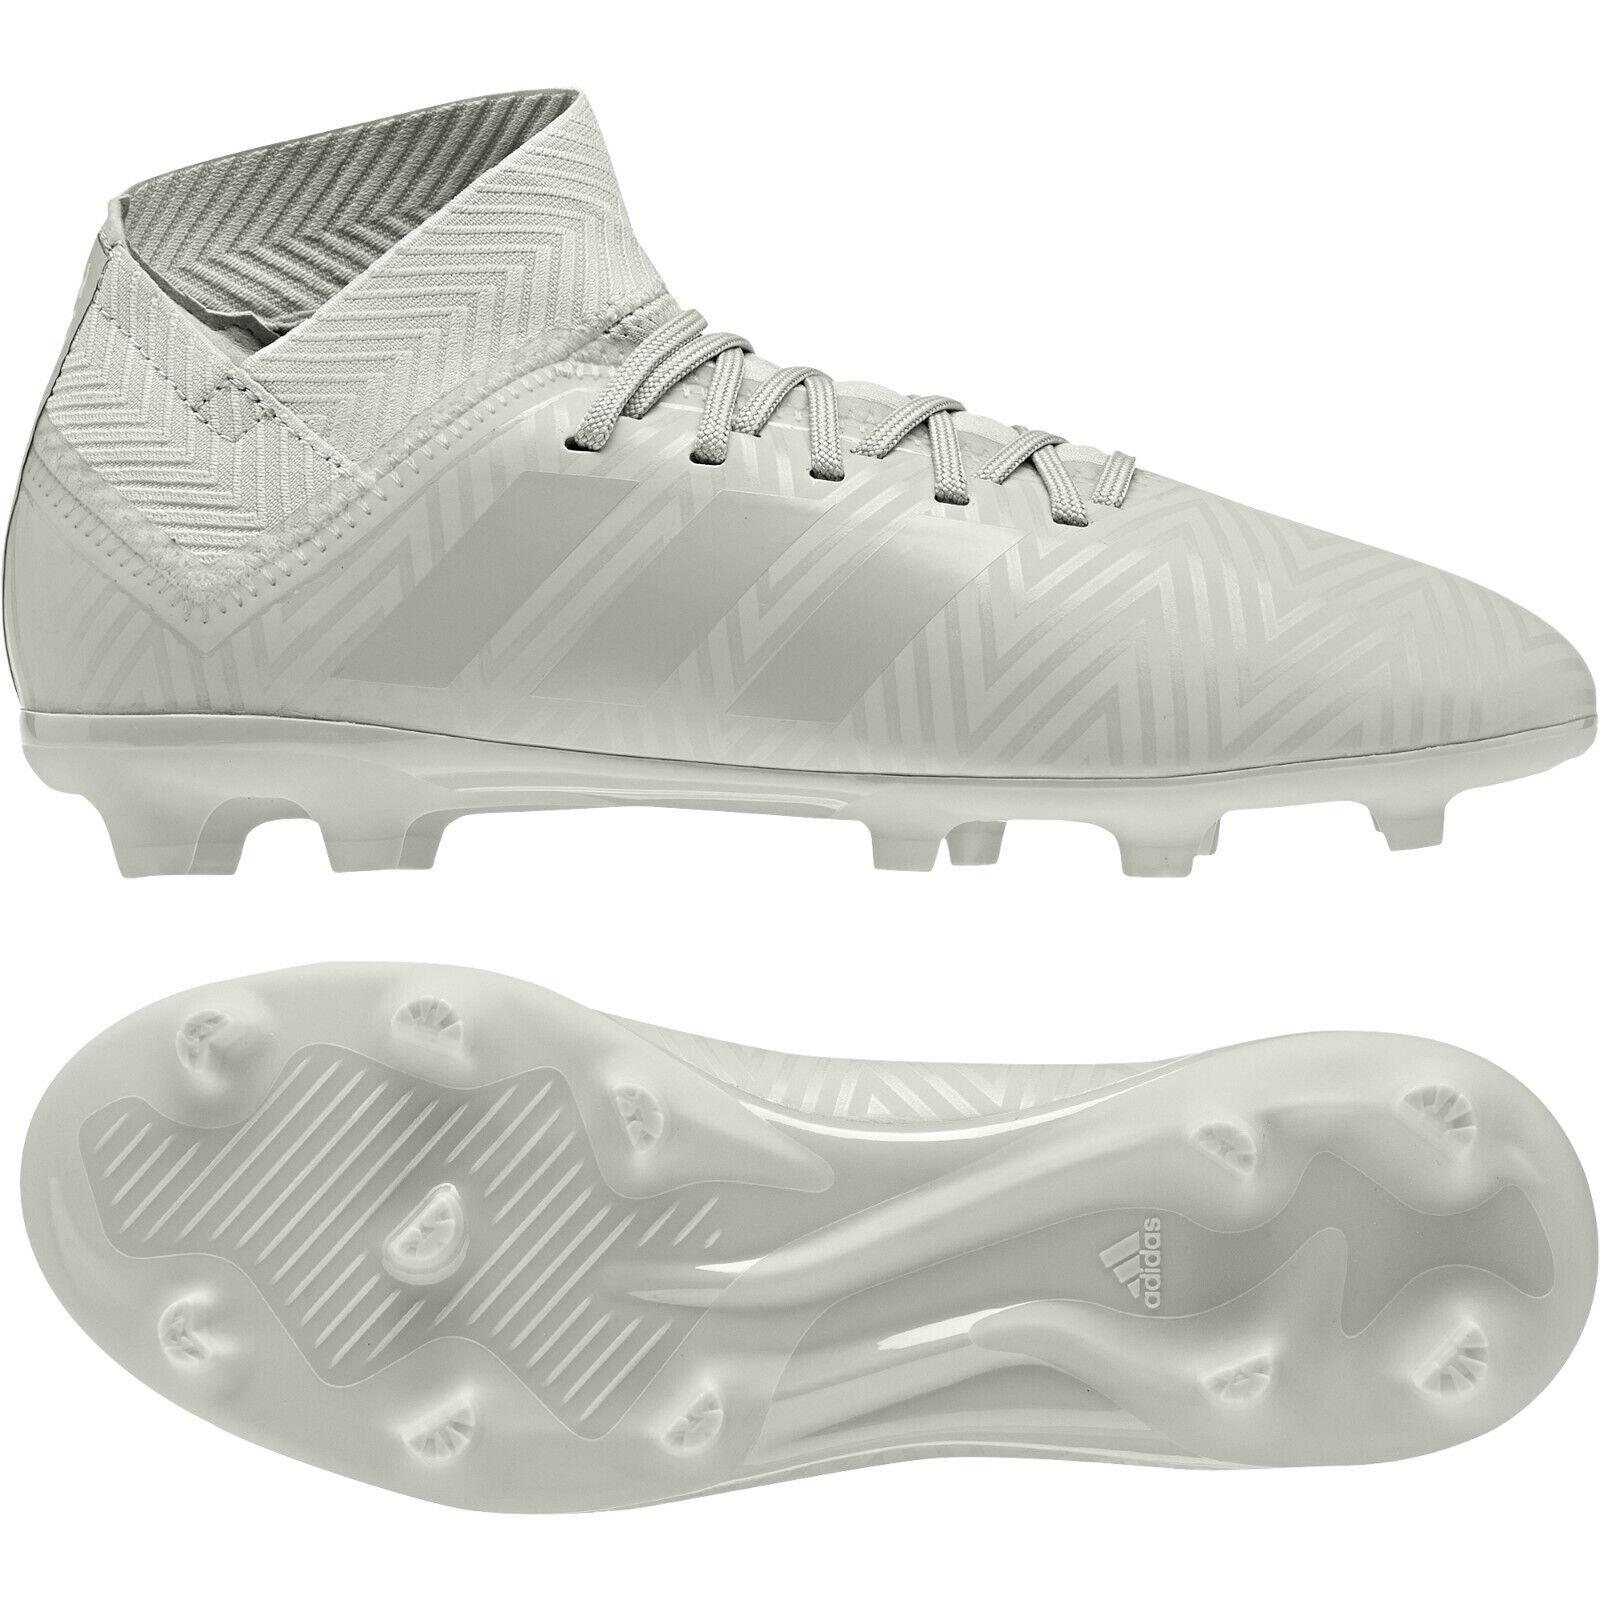 Adidas Nemeziz 18.3 FG J 38 2 3 Kinder Fußballschuhe Firm Ground grau DB2353 NEU